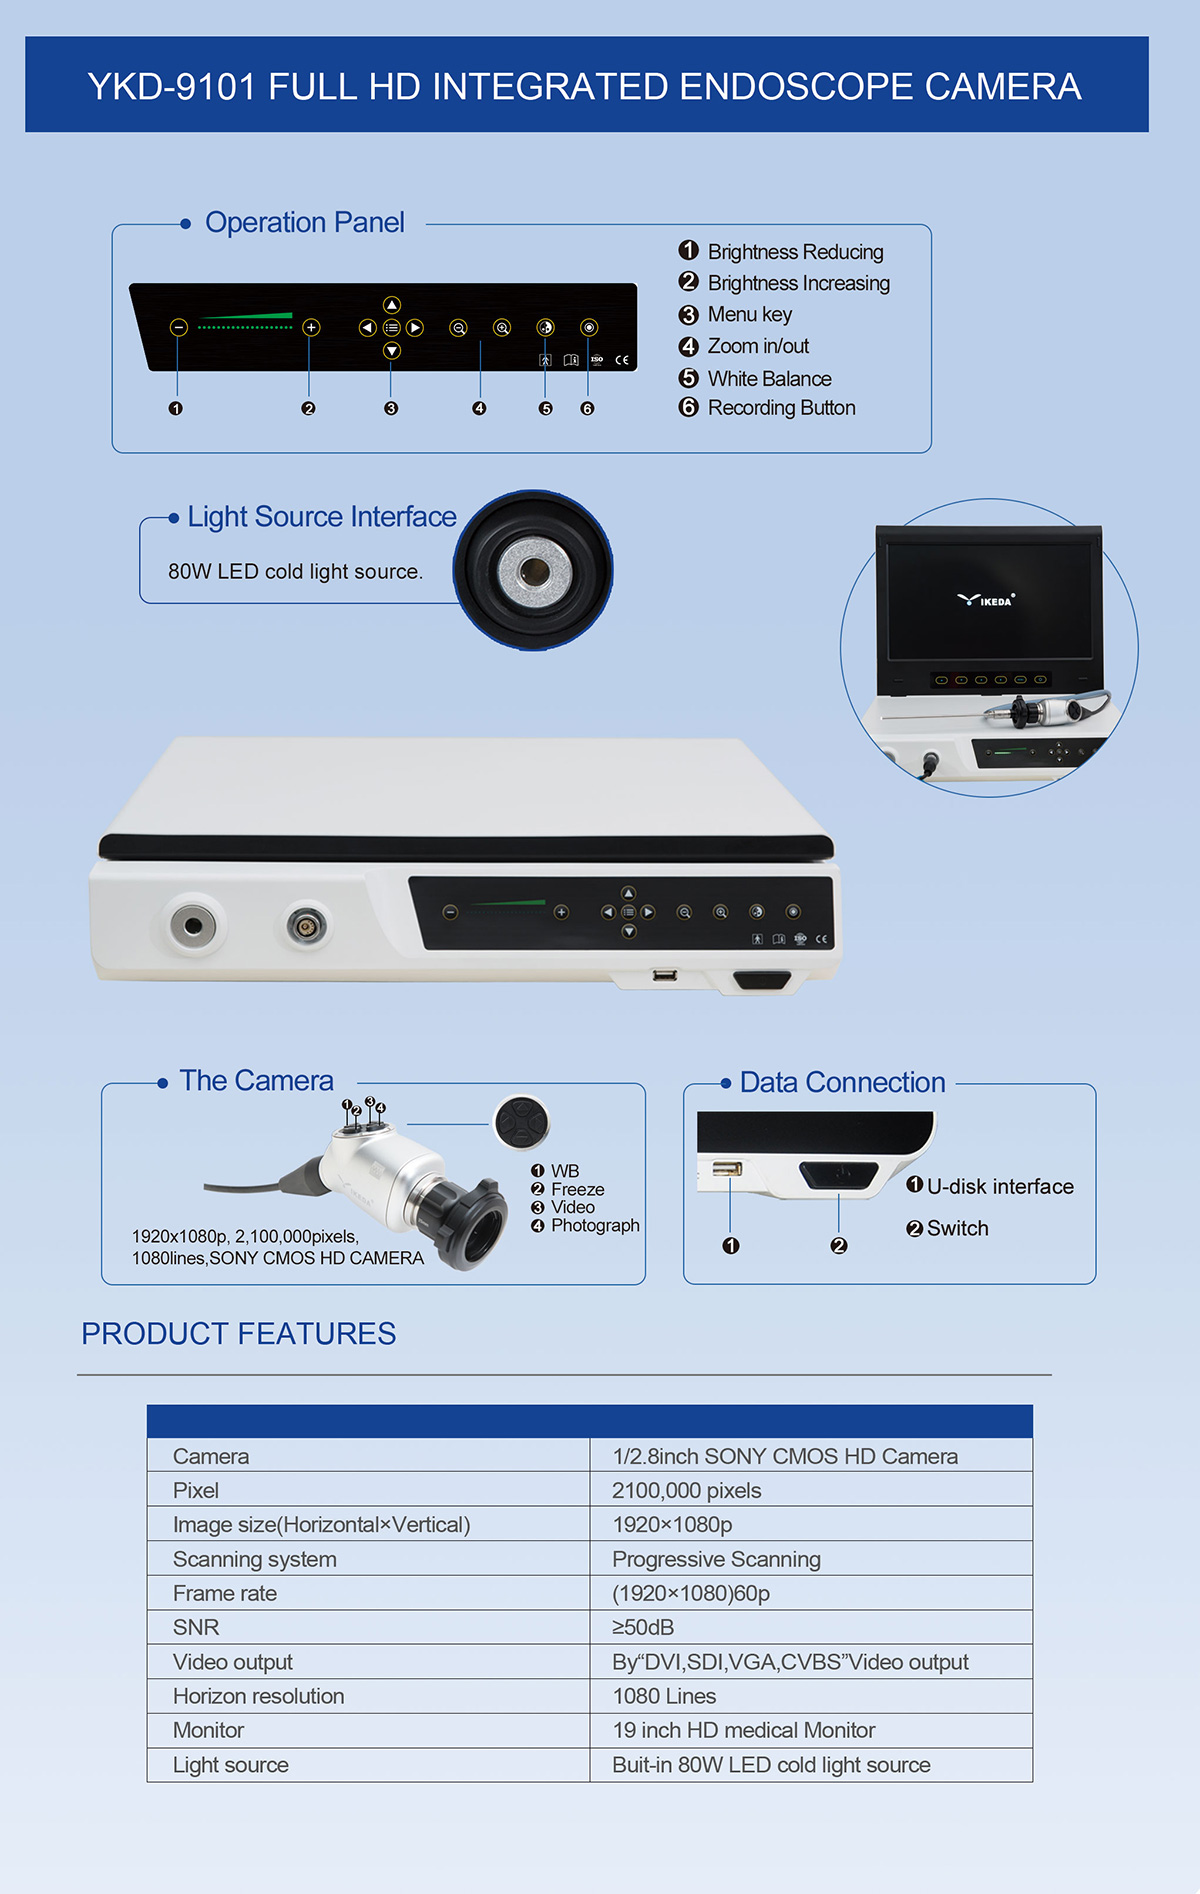 YKD-9101 19 inch Full HD portable endoscope camera